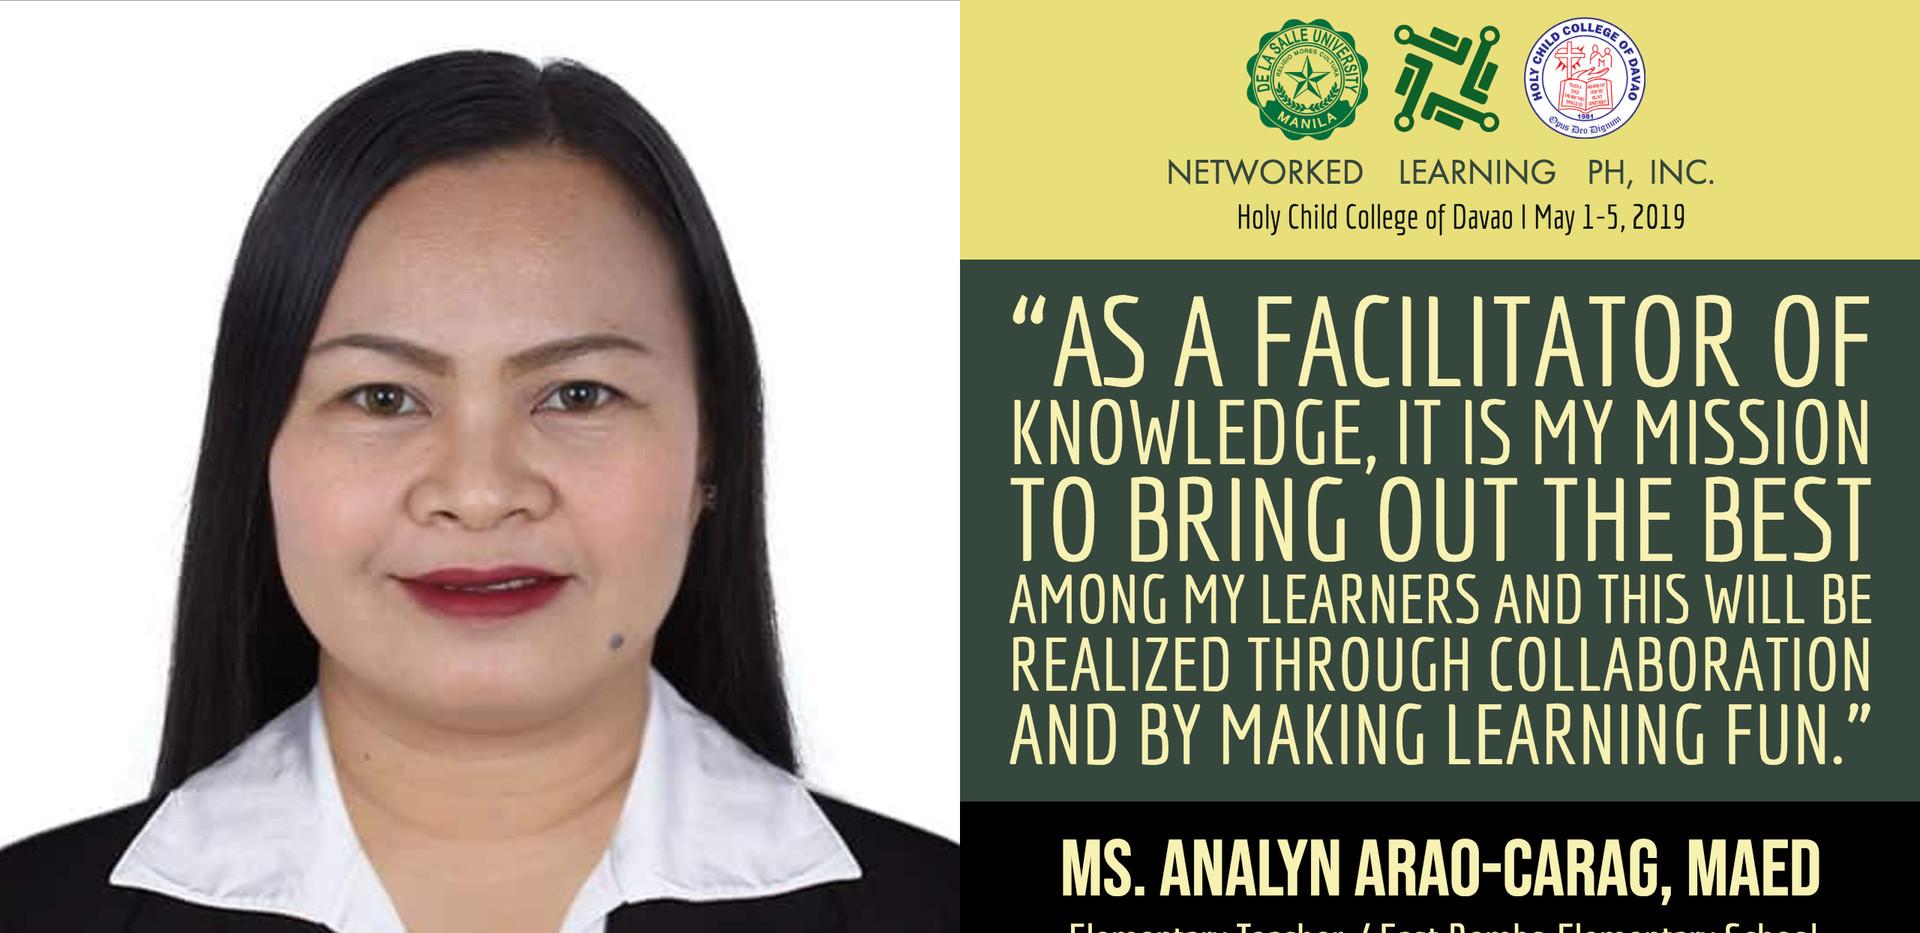 Ms. Analyn Arao-Carag